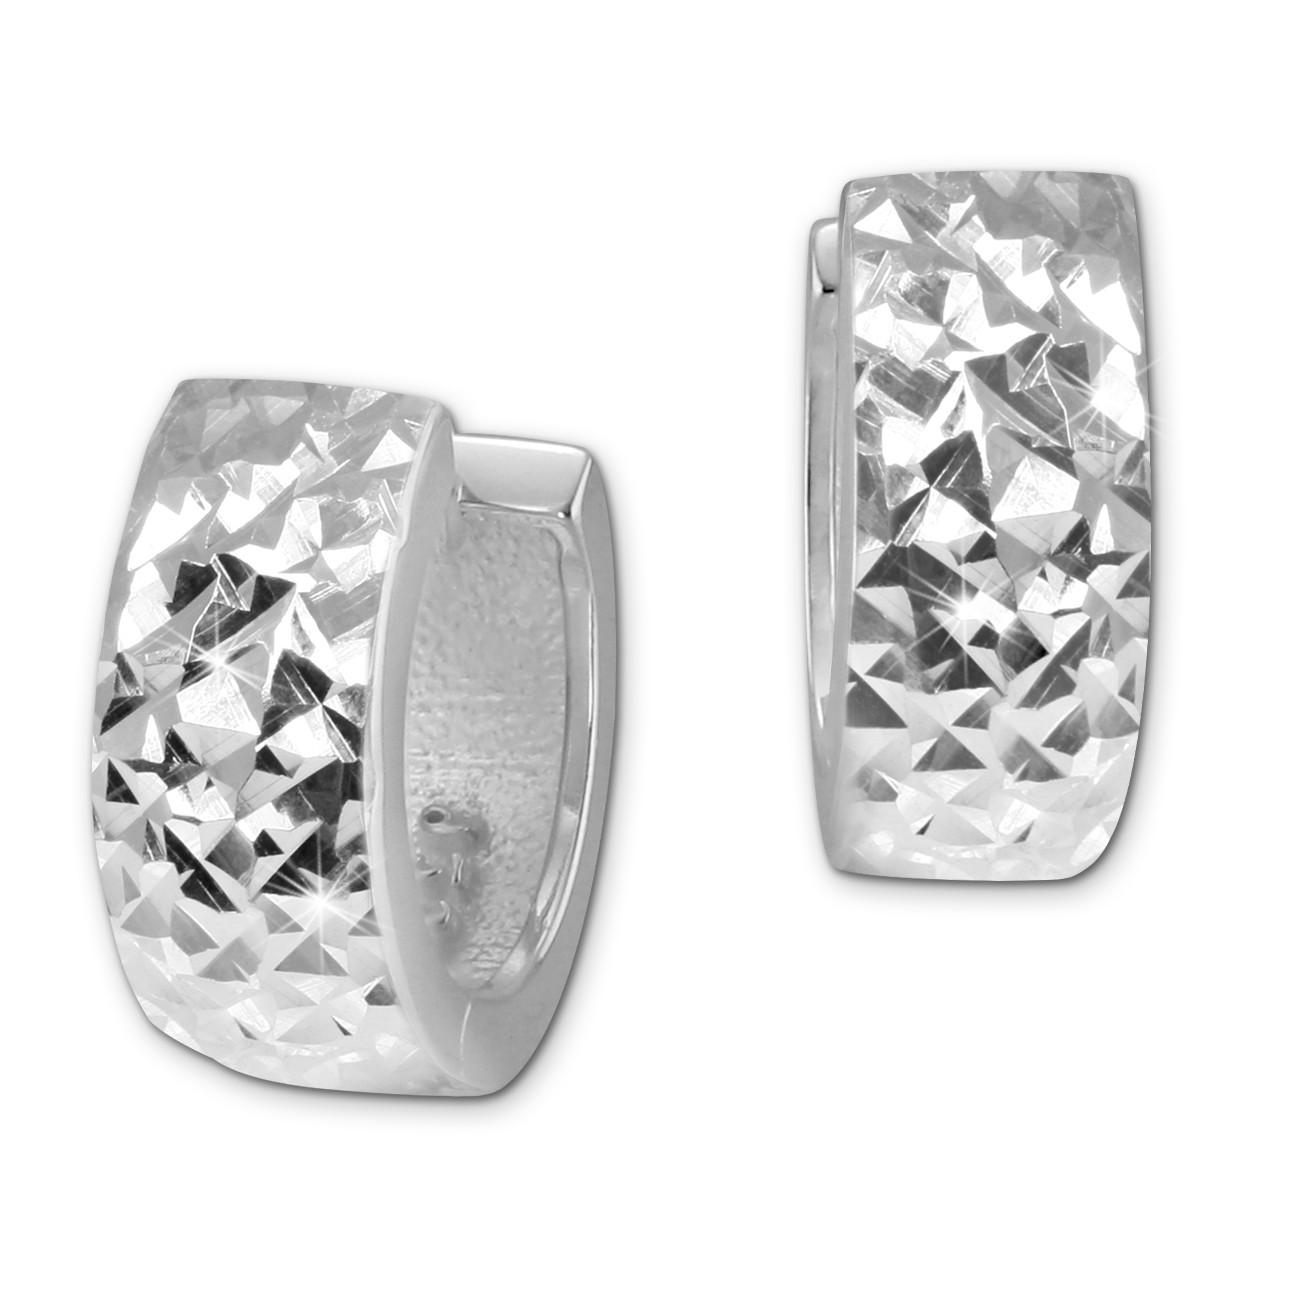 SilberDream Creole diamantiert 11mm 925 Sterling Silber Ohrring SDO4276J